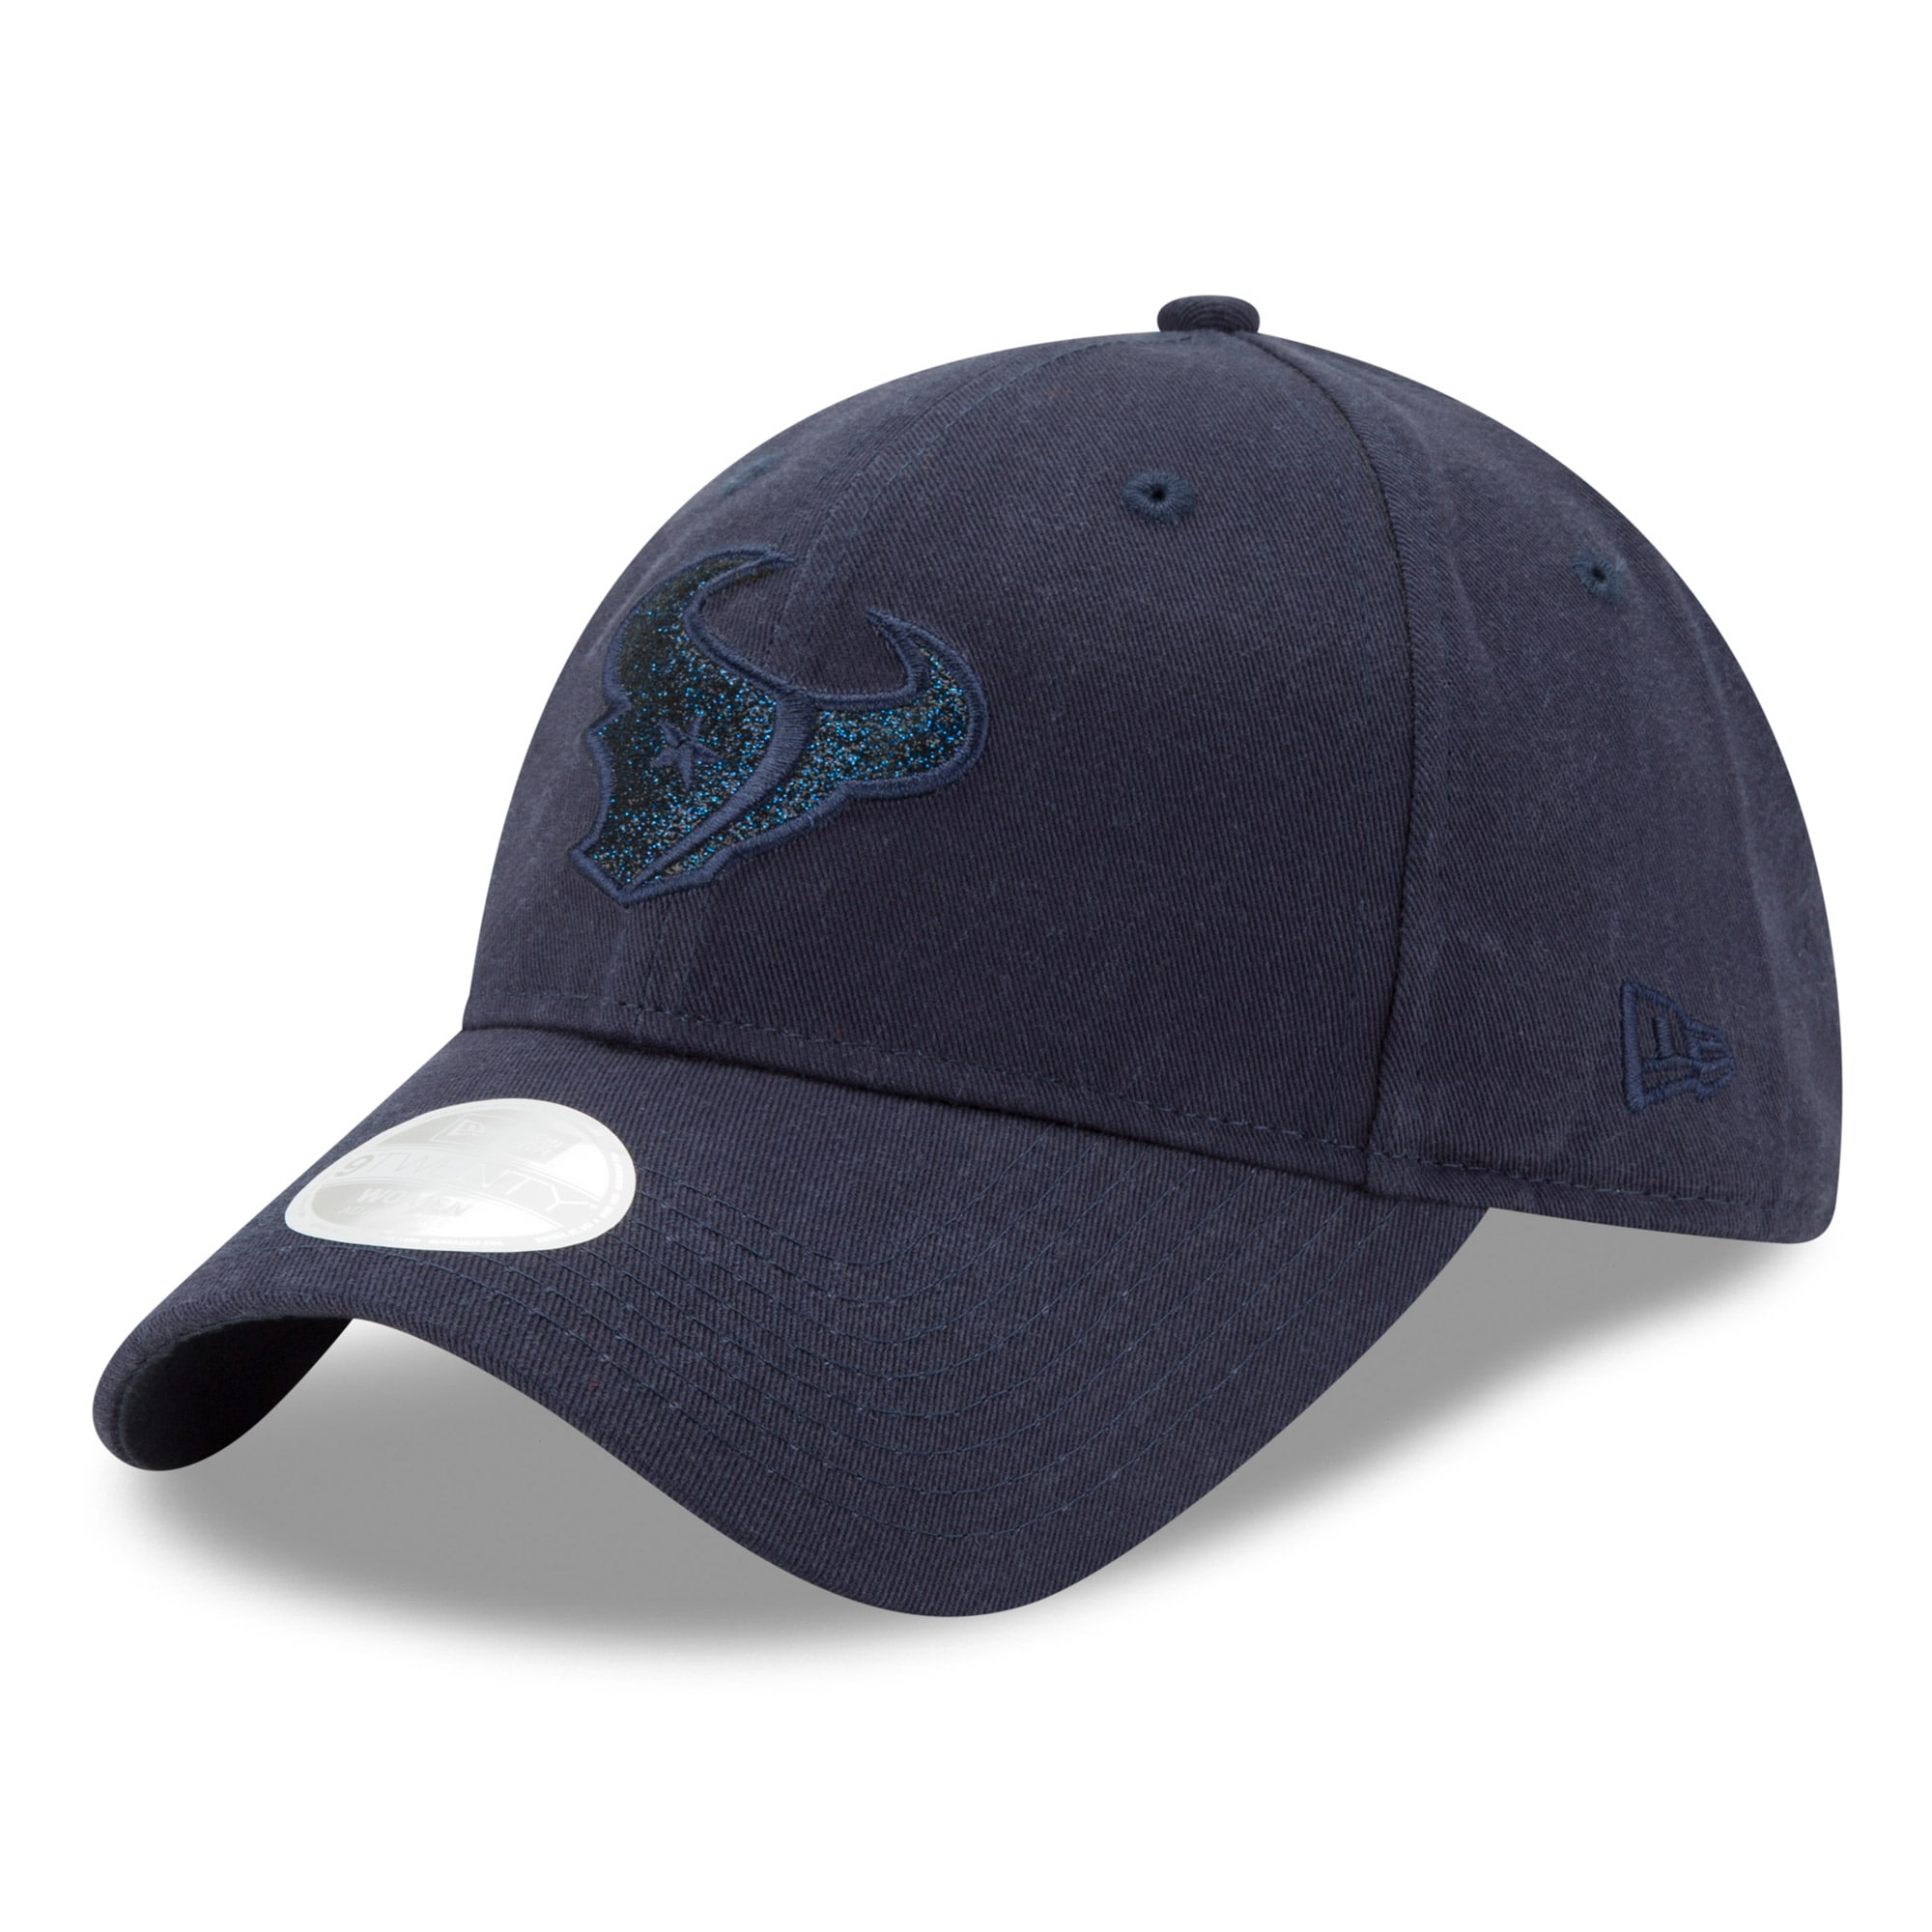 Houston Texans New Era Women's Team Glisten Tonal 9TWENTY Adjustable Hat - Navy